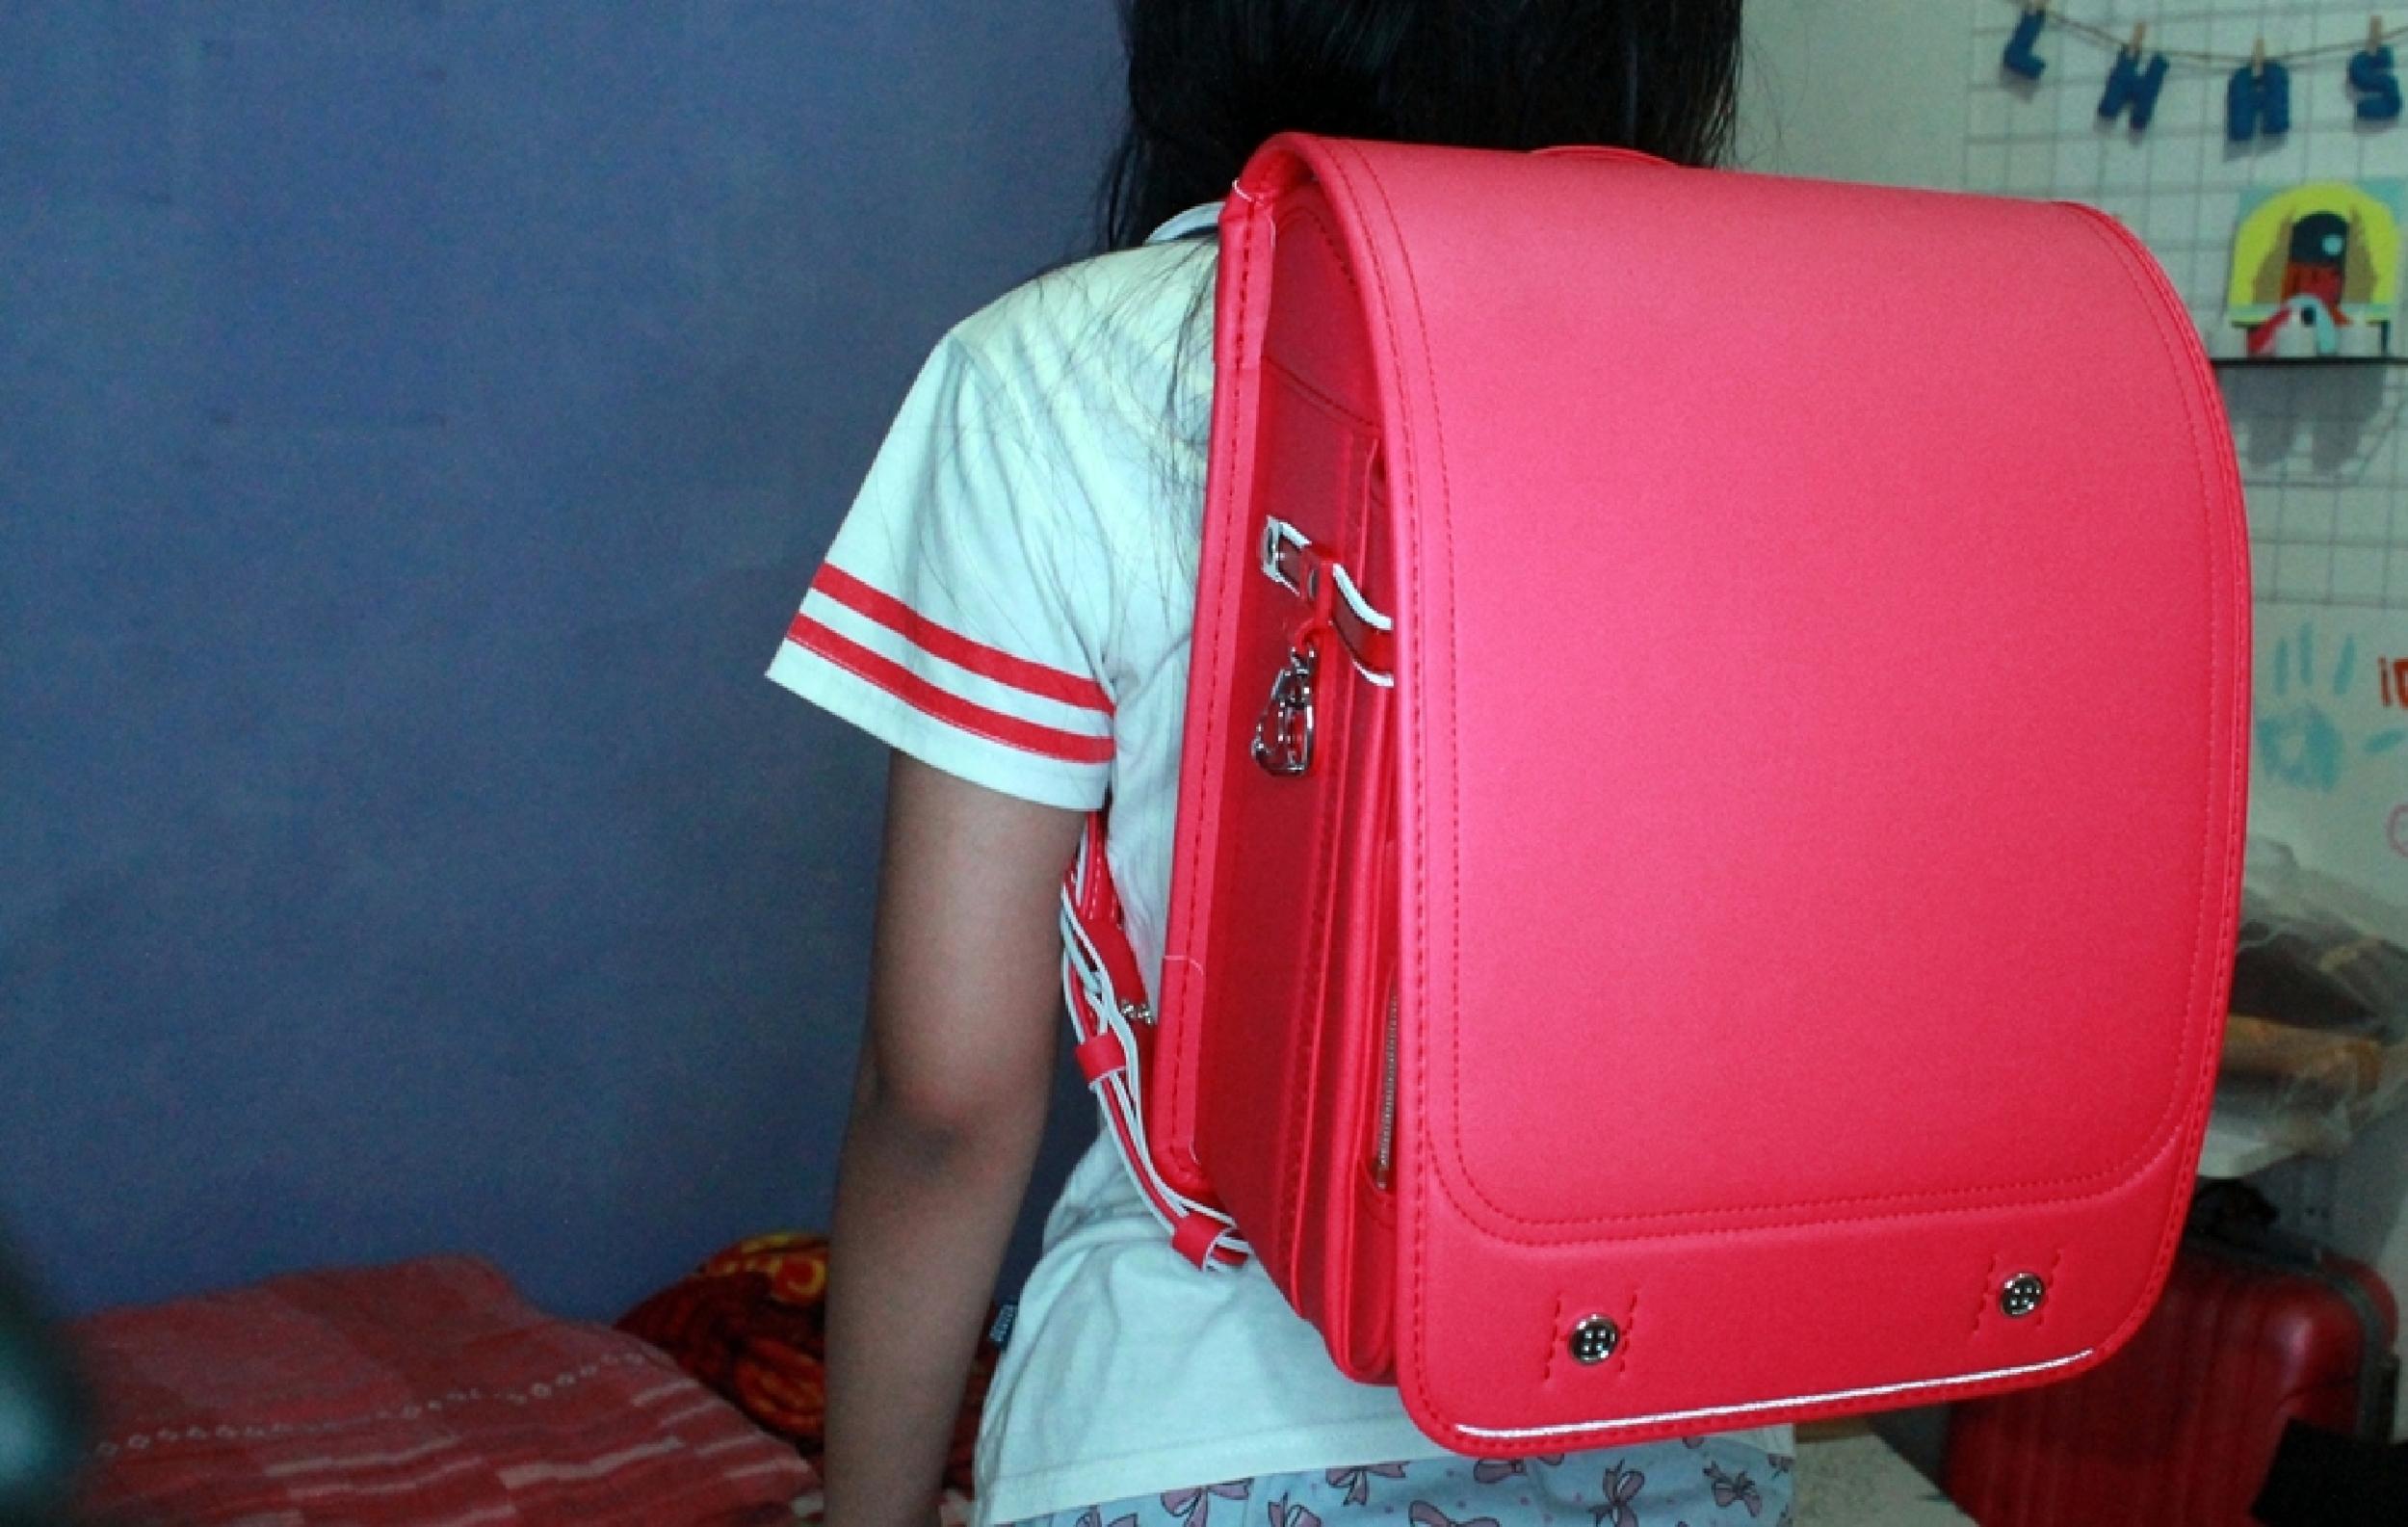 3 Fakta randoseru, tas sekolah di Jepang yang jarang diketahui